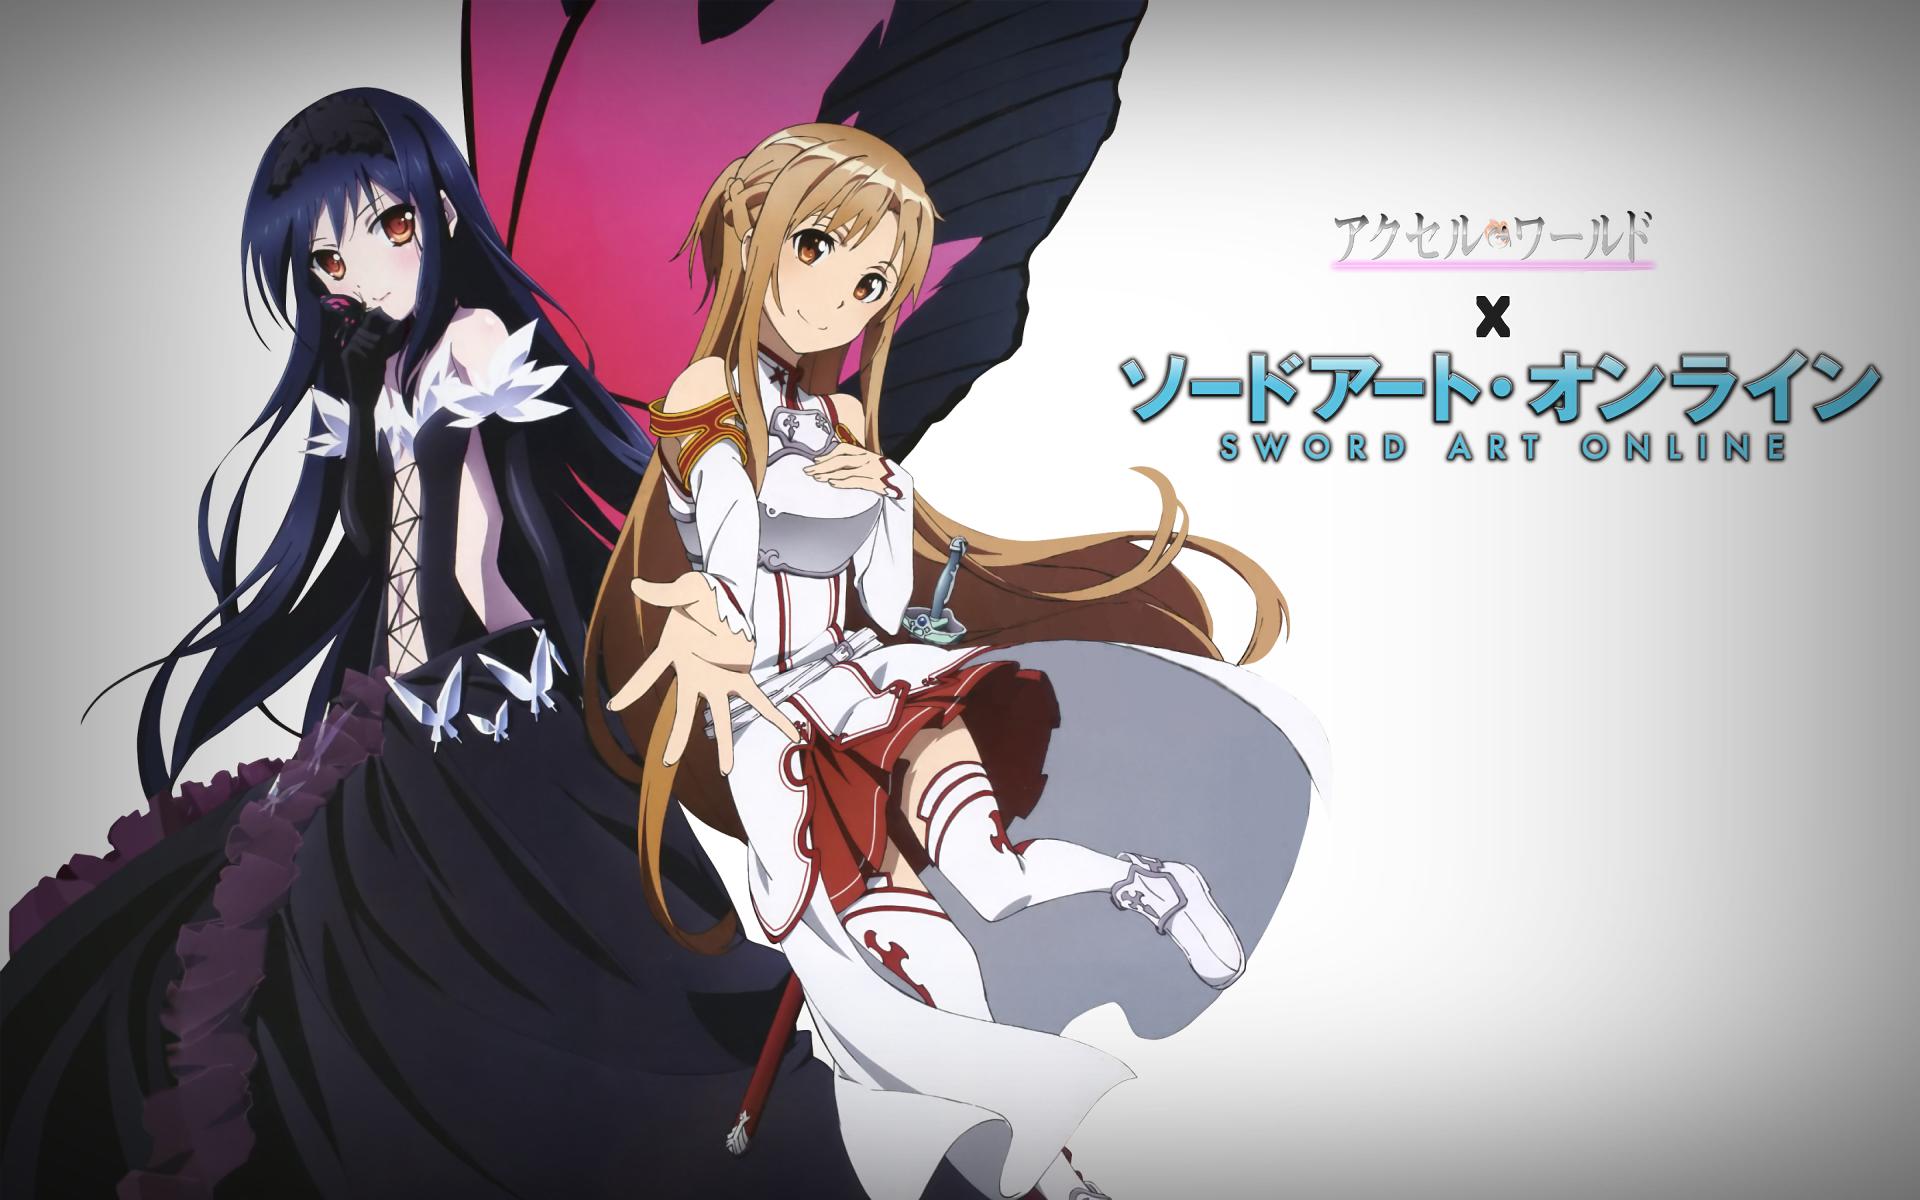 Anime Crossover Asuna Yuuki Kuroyukihime Accel World Sword Art